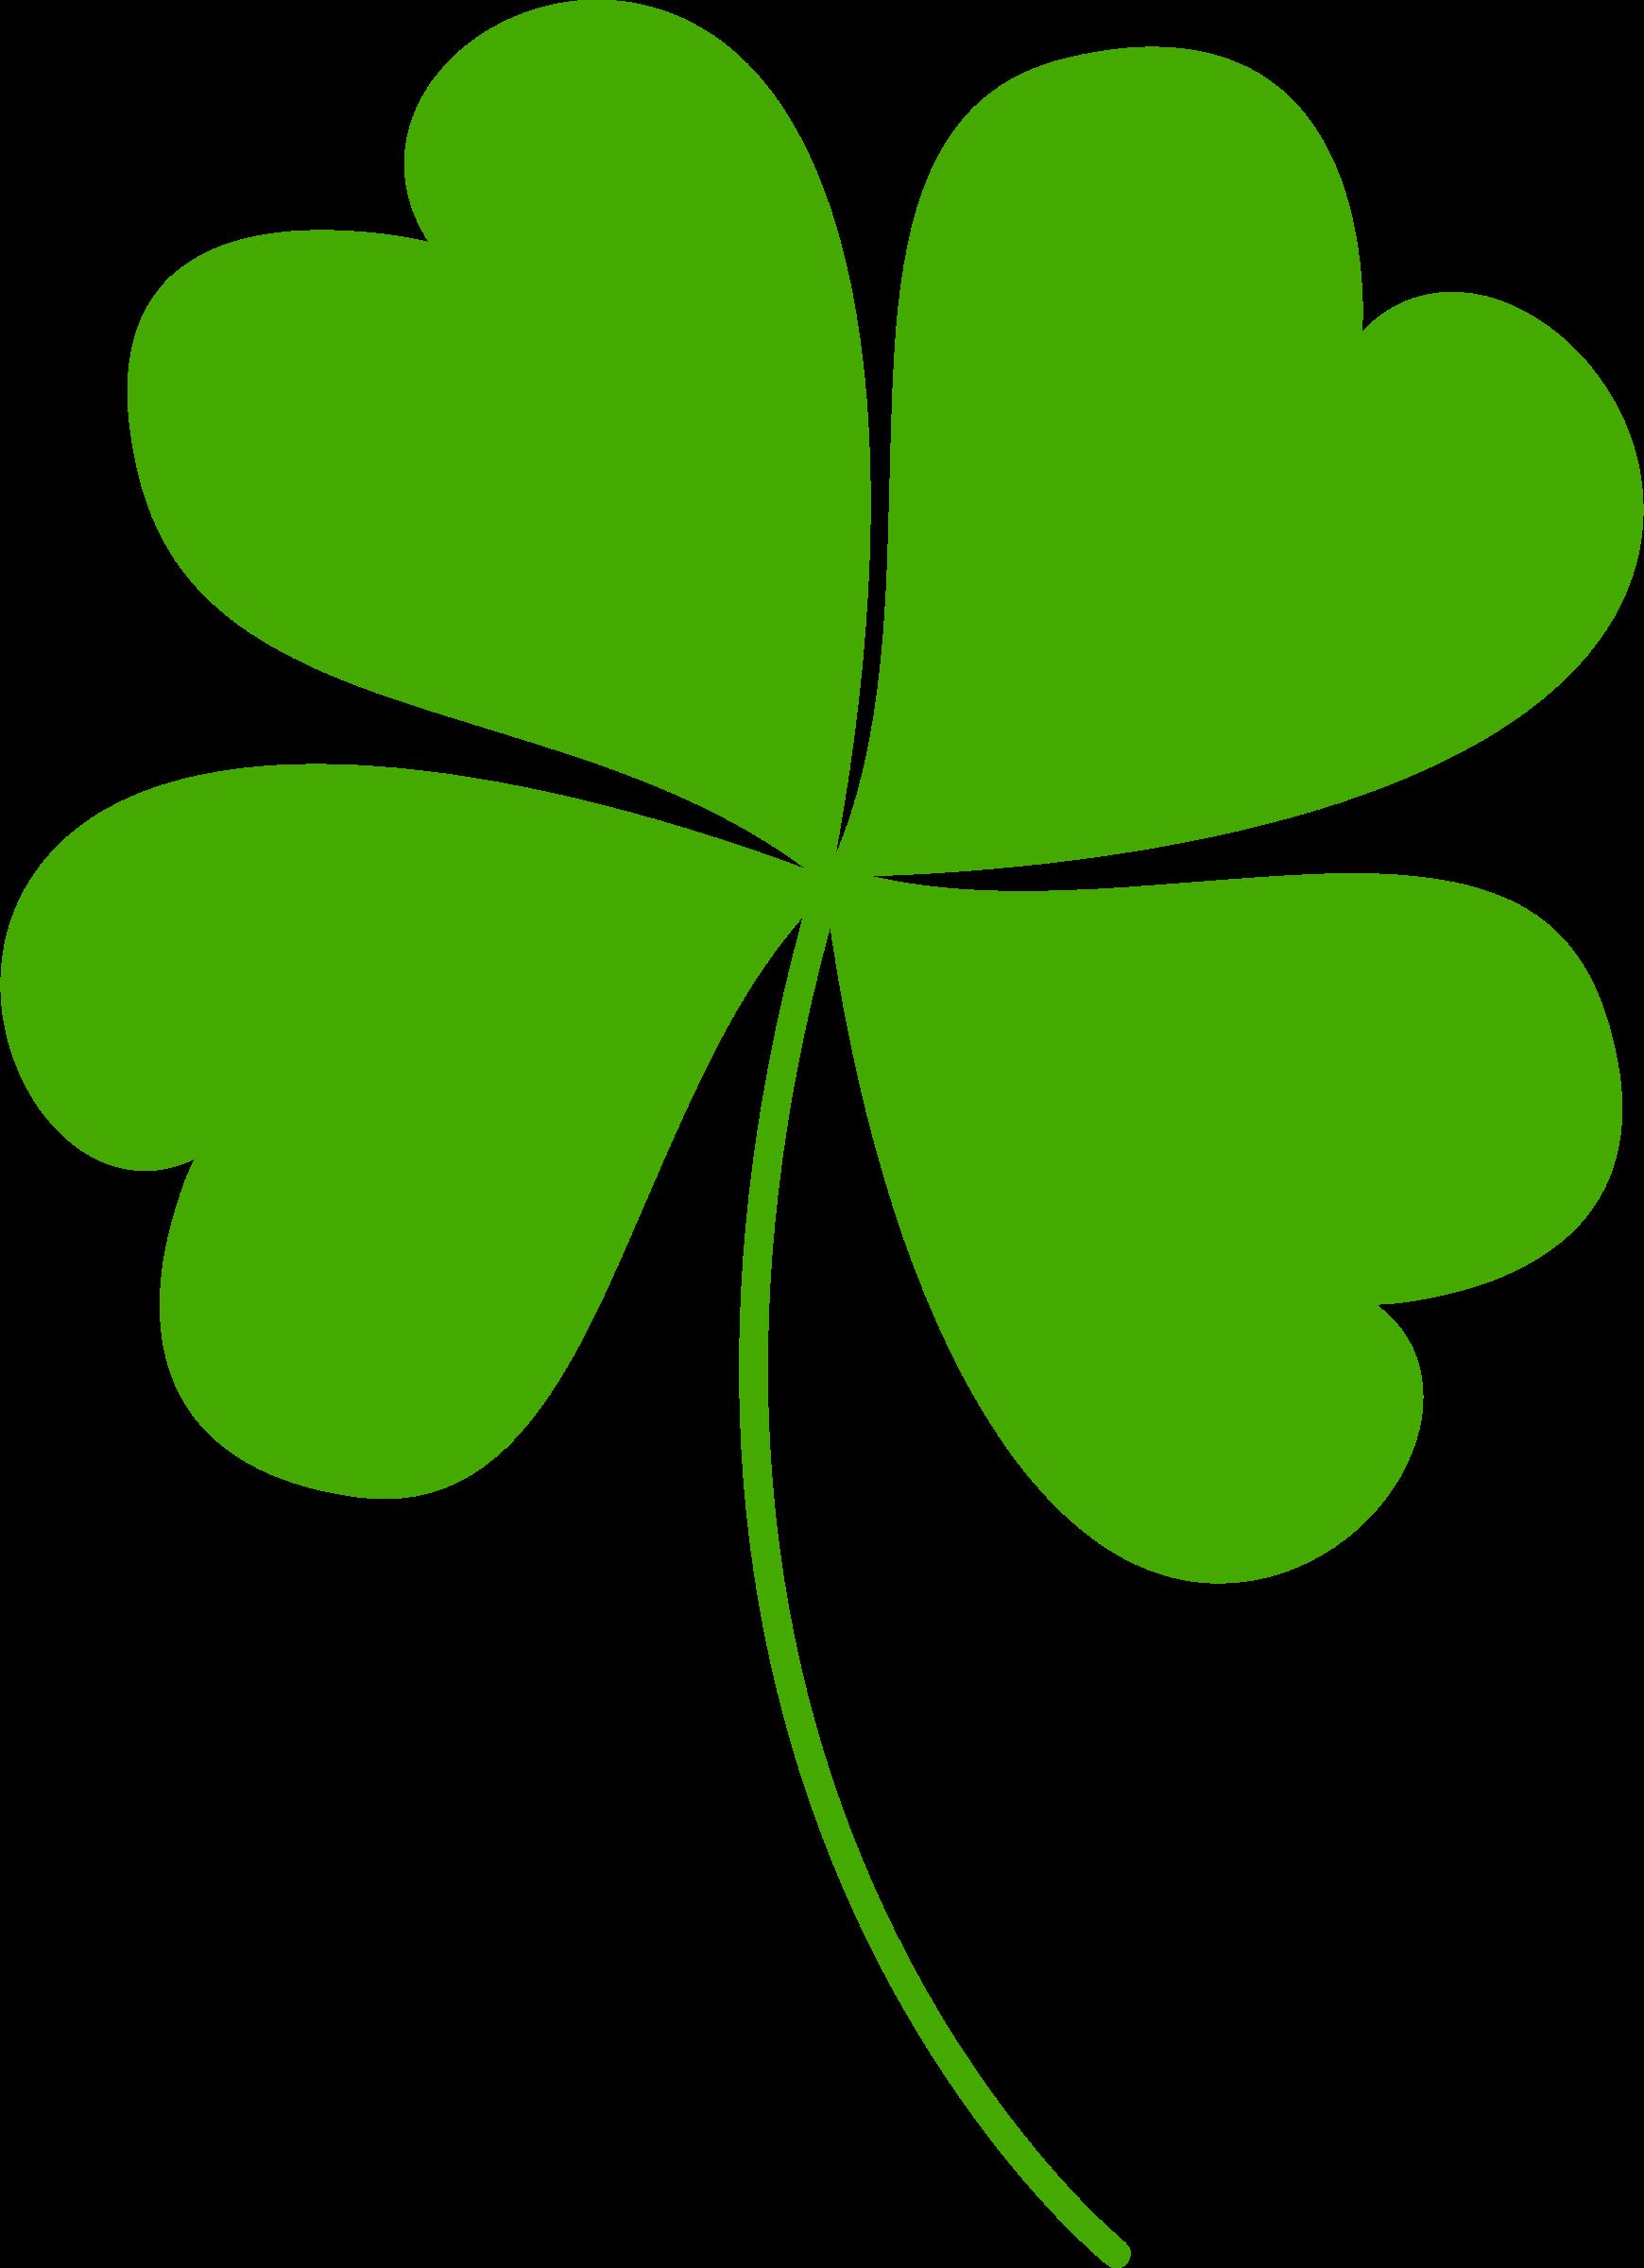 Clover clipart original. Four leaf vectorized big